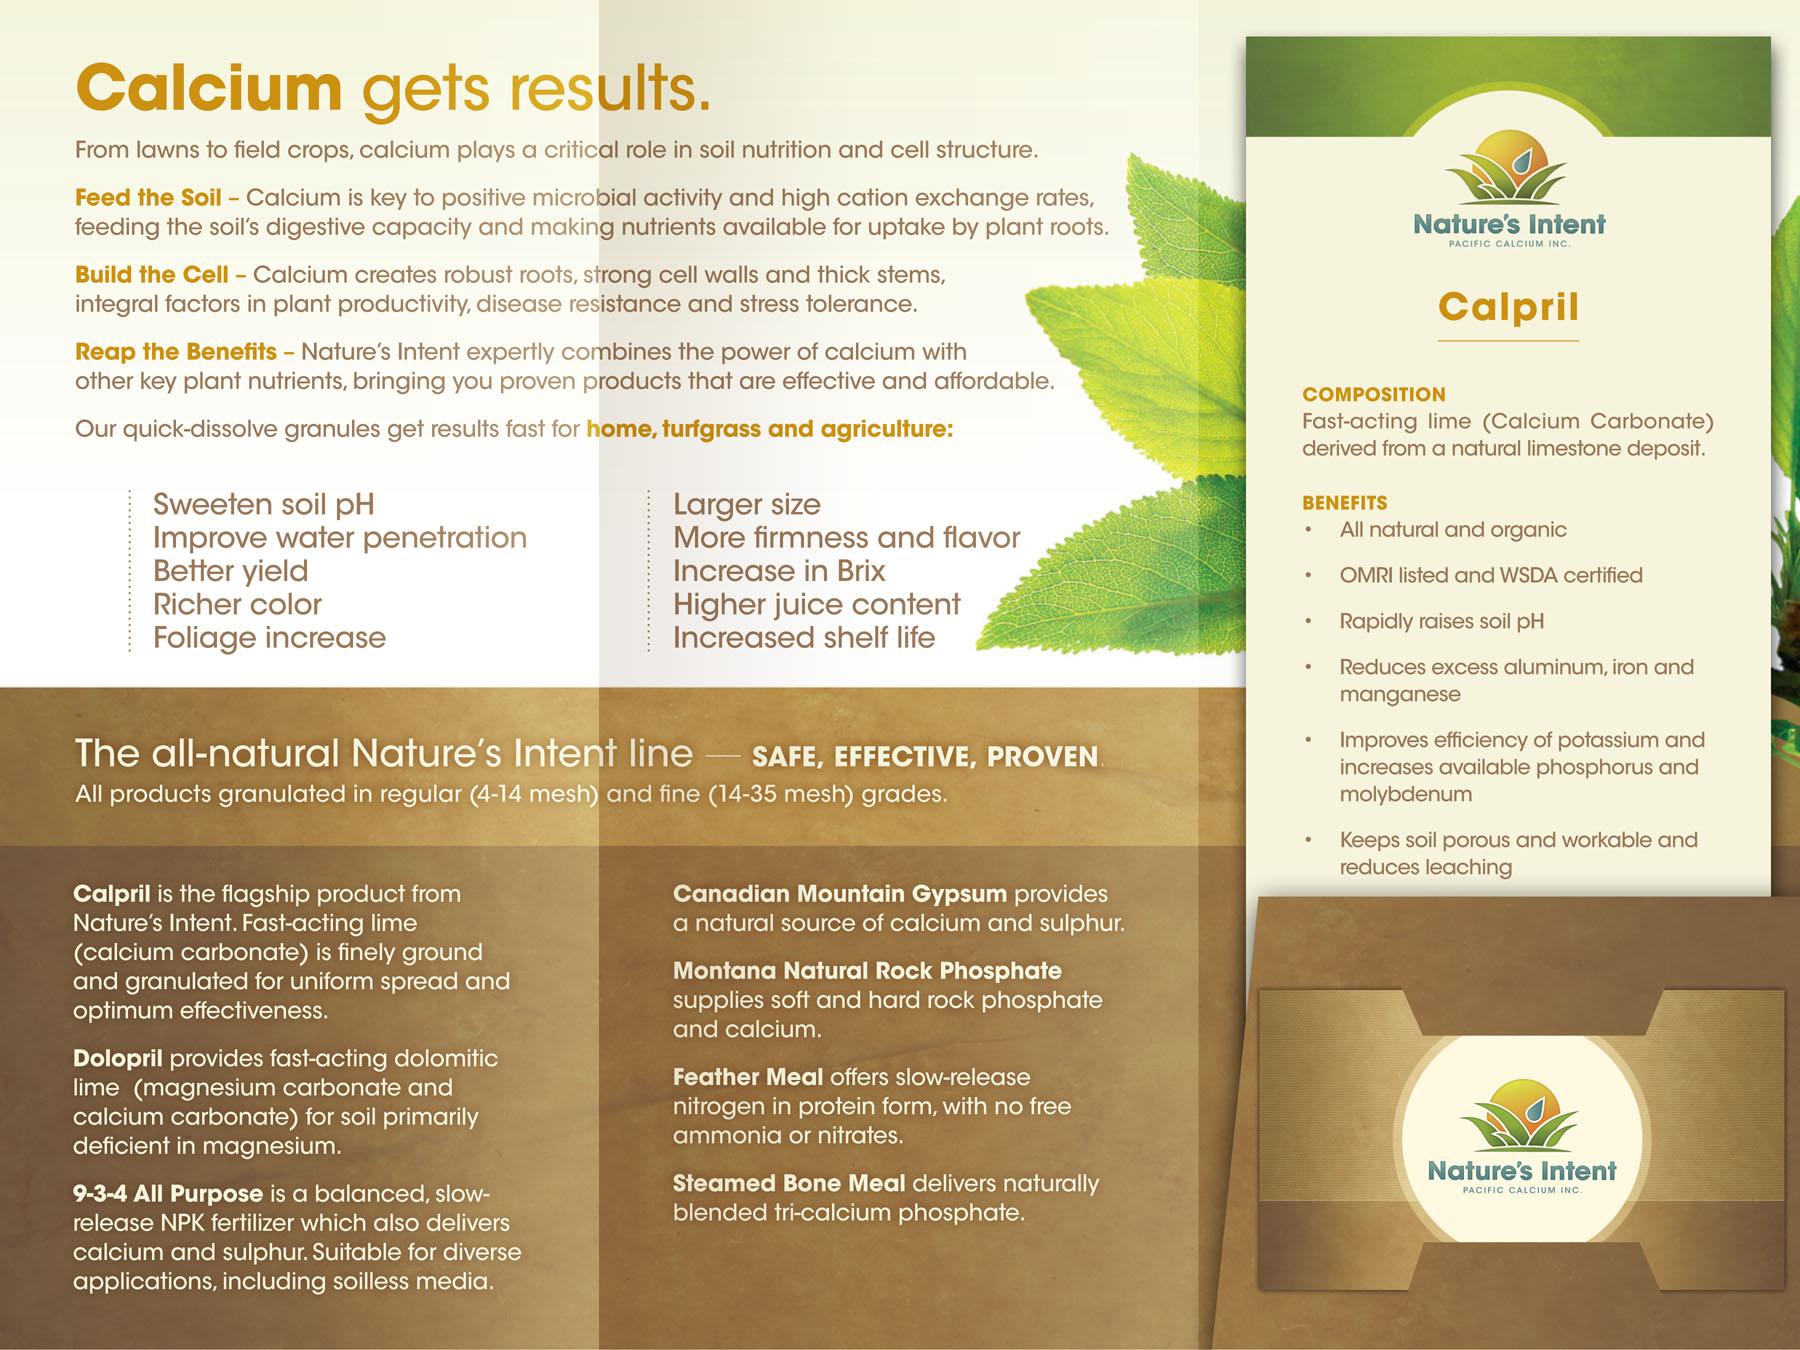 Branding, brochure direction/design and copywriting.